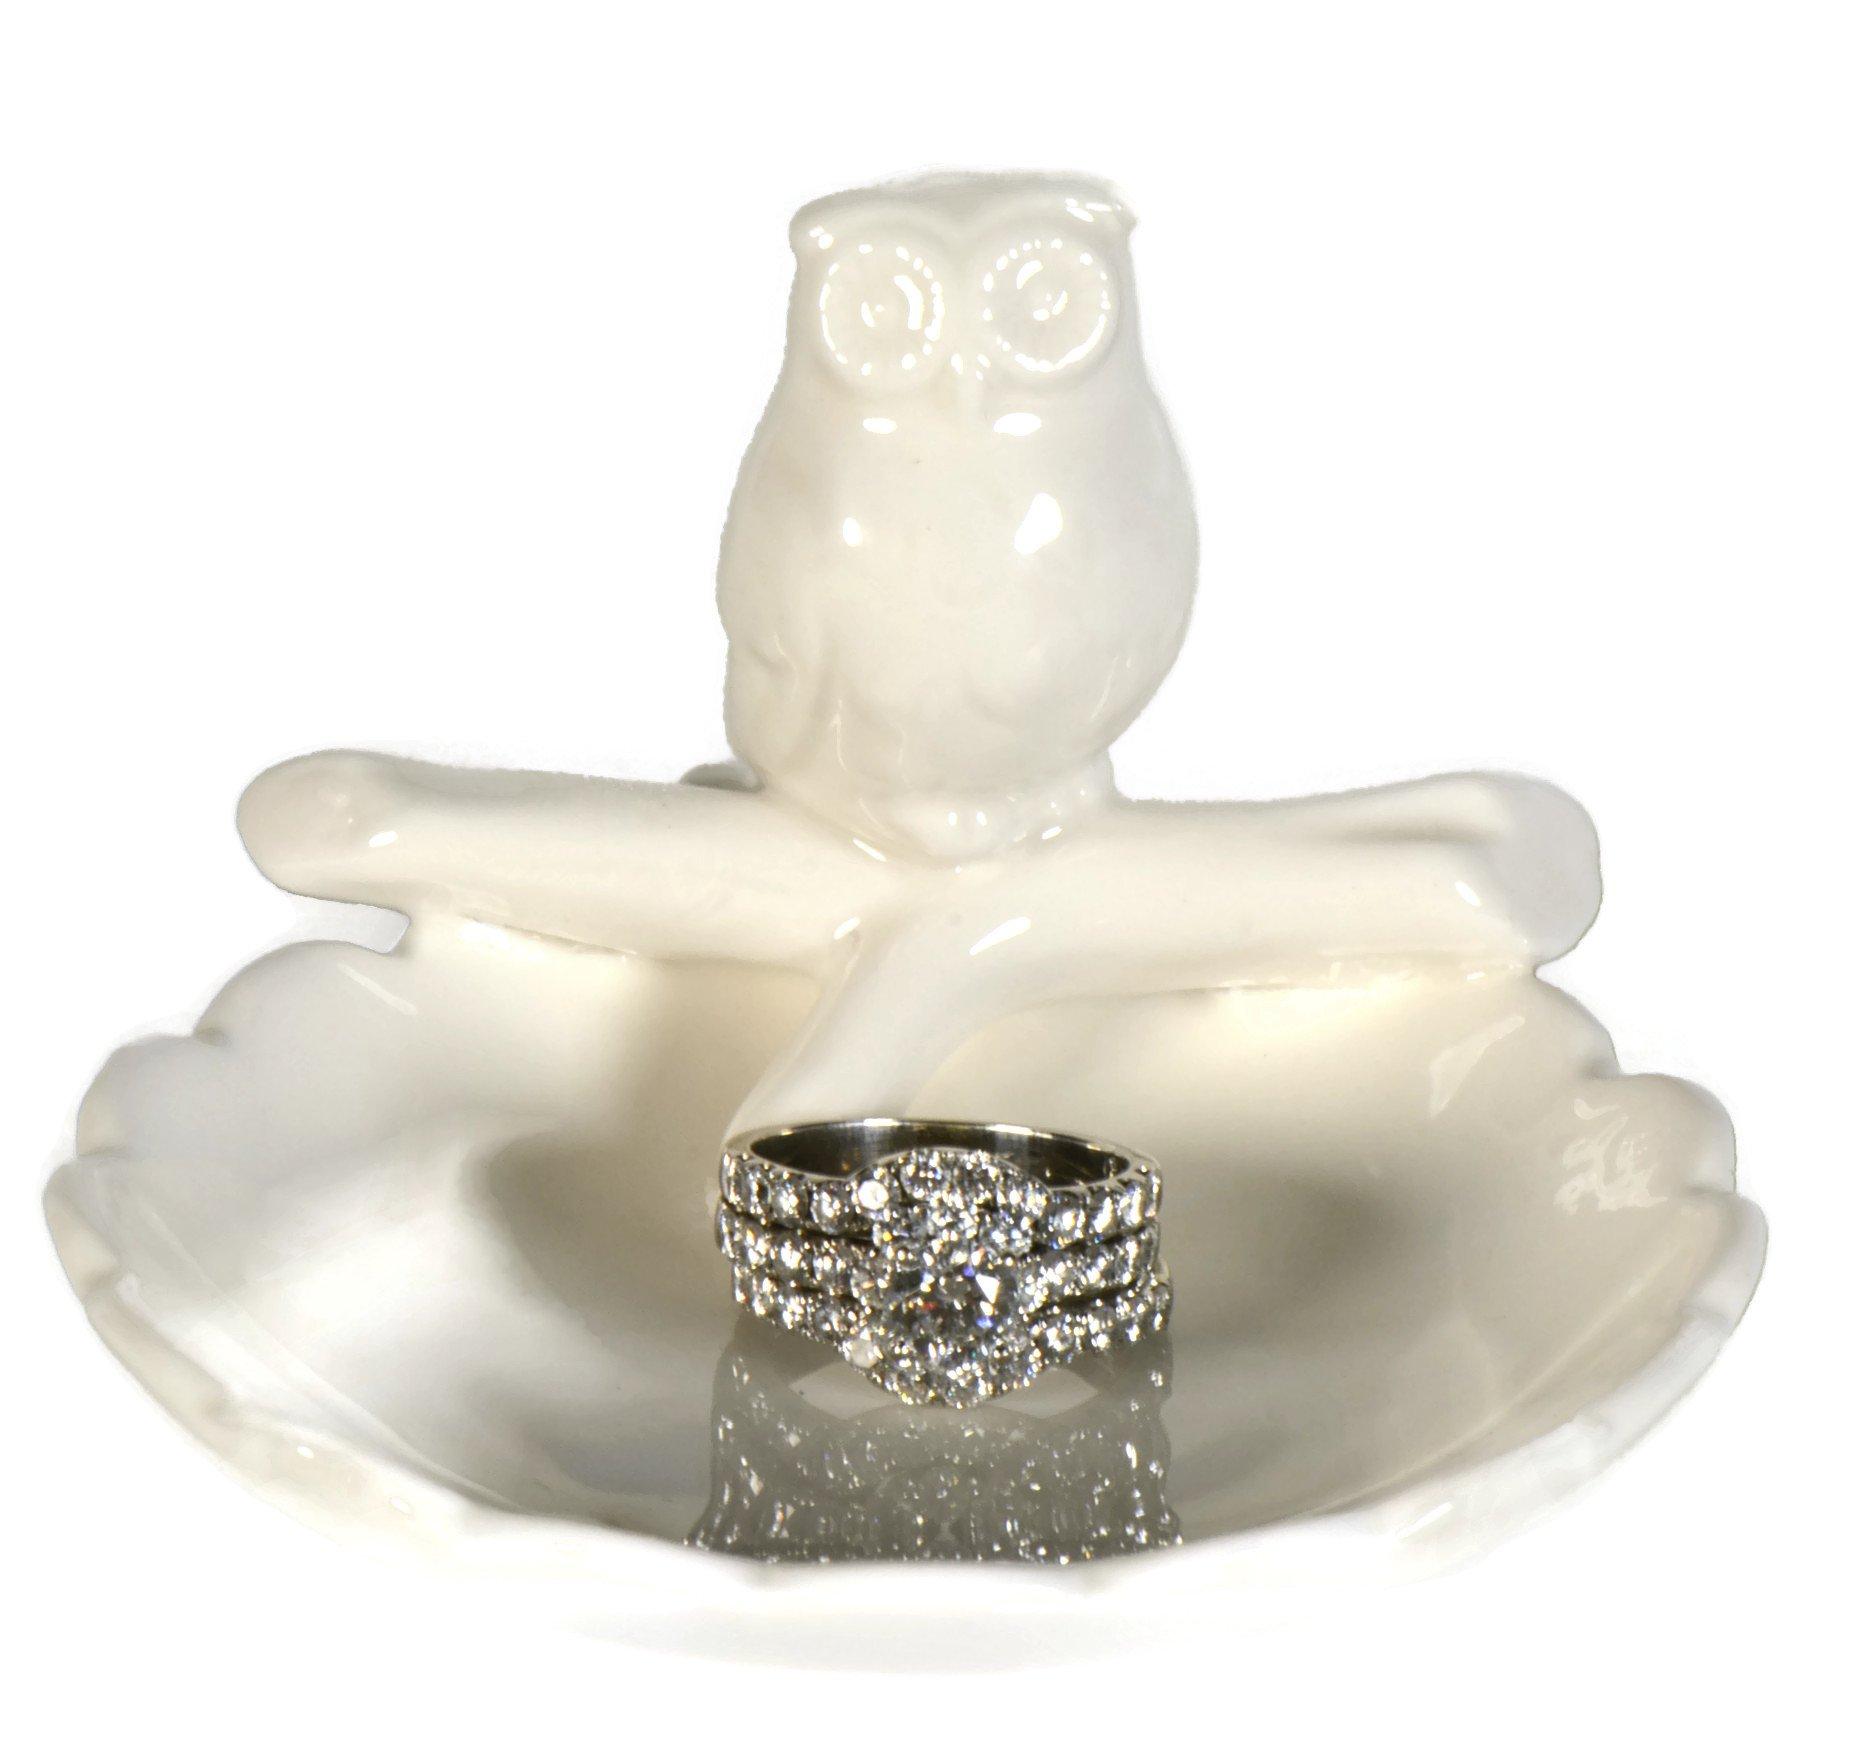 box glass christmas ornament 699 owl ring holder dish cute white ceramic engagement wedding ring holder measures 325wx225hx375d - Christmas Ornament Ring Box